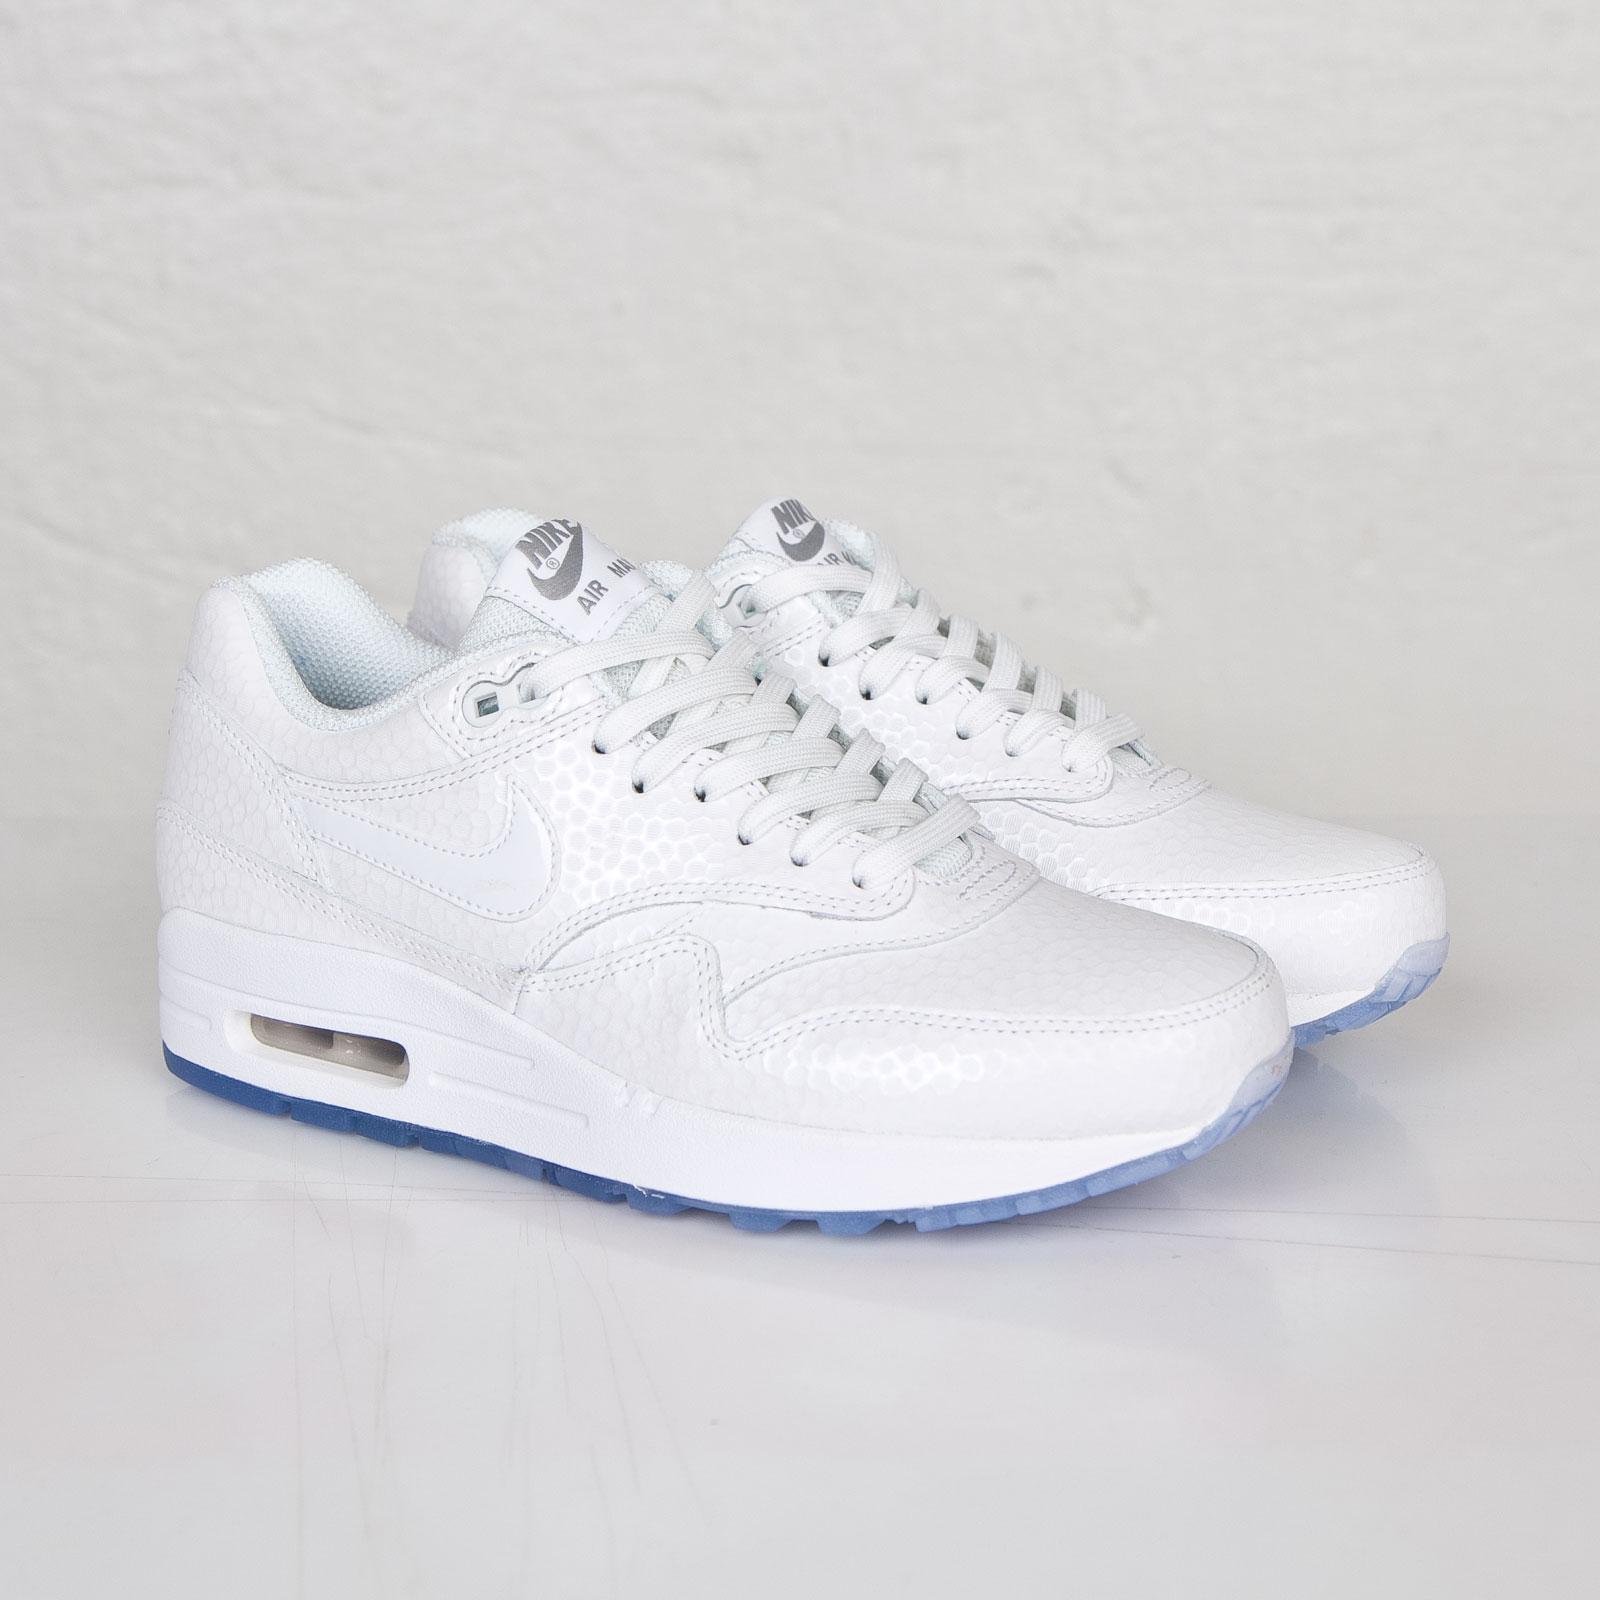 Nike Wmns Air Max 1 Premium - 454746-106 - Sneakersnstuff ...